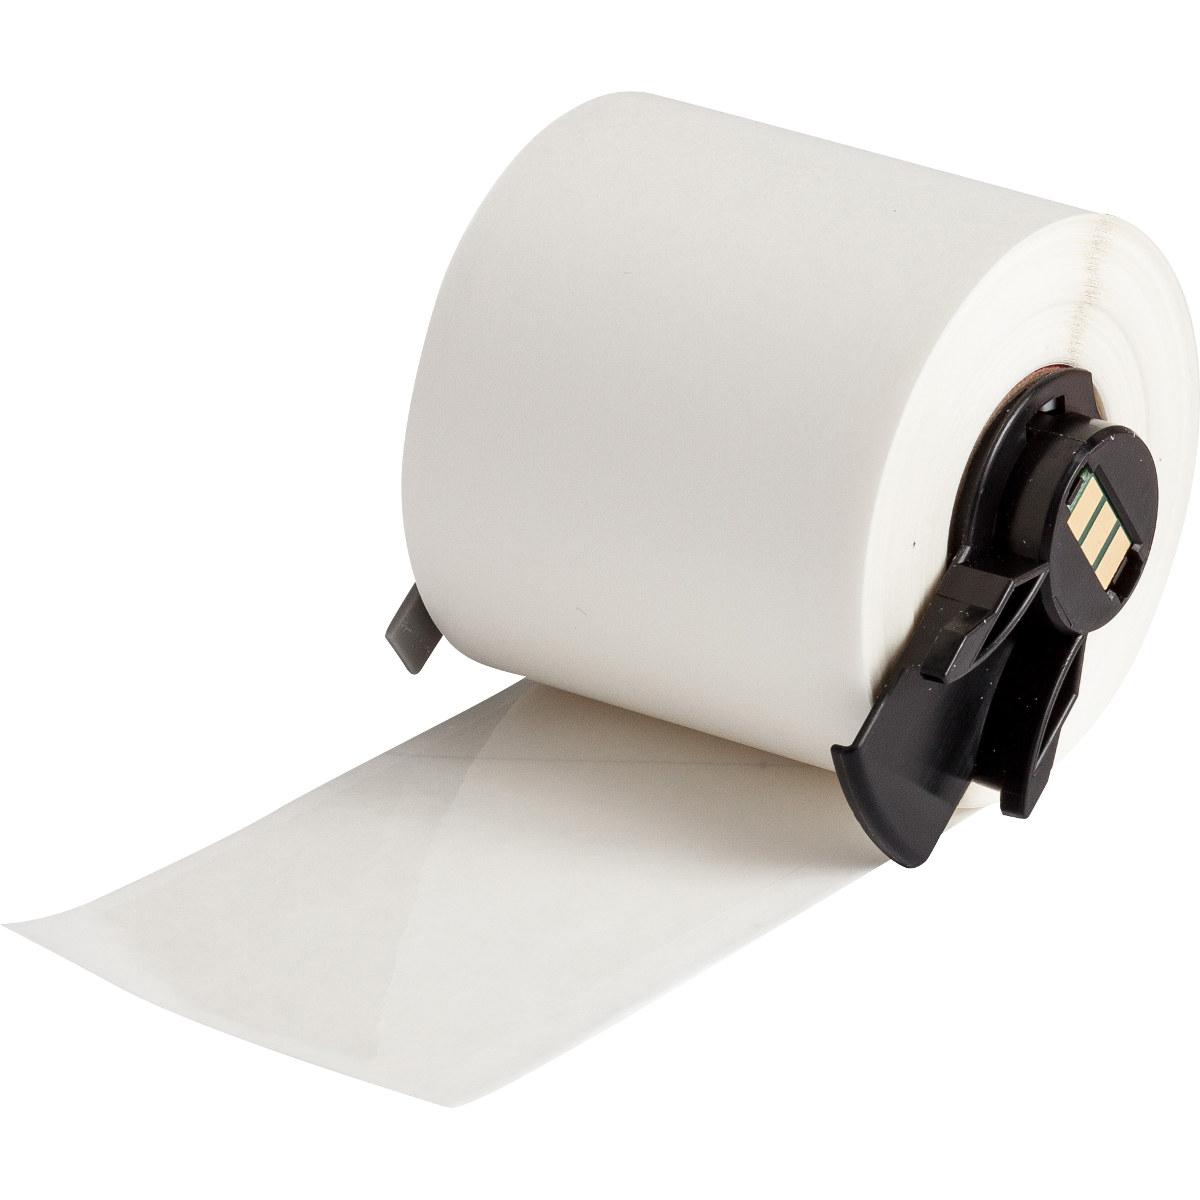 Brady PTL-43-430 Printer Label Roll, 1 9 in x 50 ft